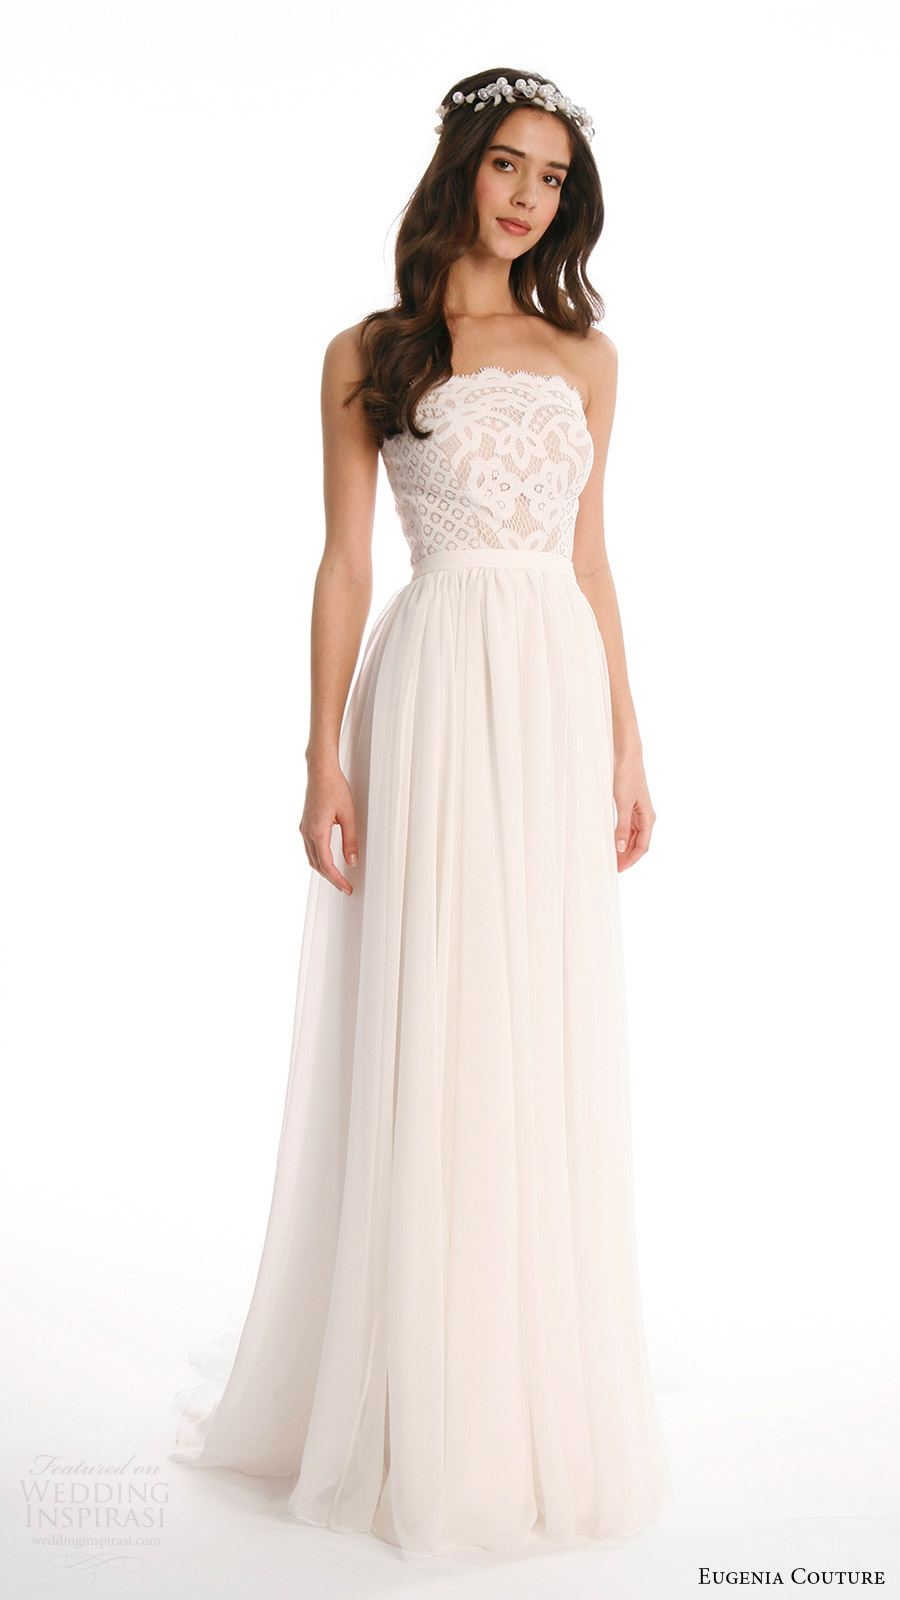 Eugenia couture spring 2017 wedding dresses joy bridal for Define couture